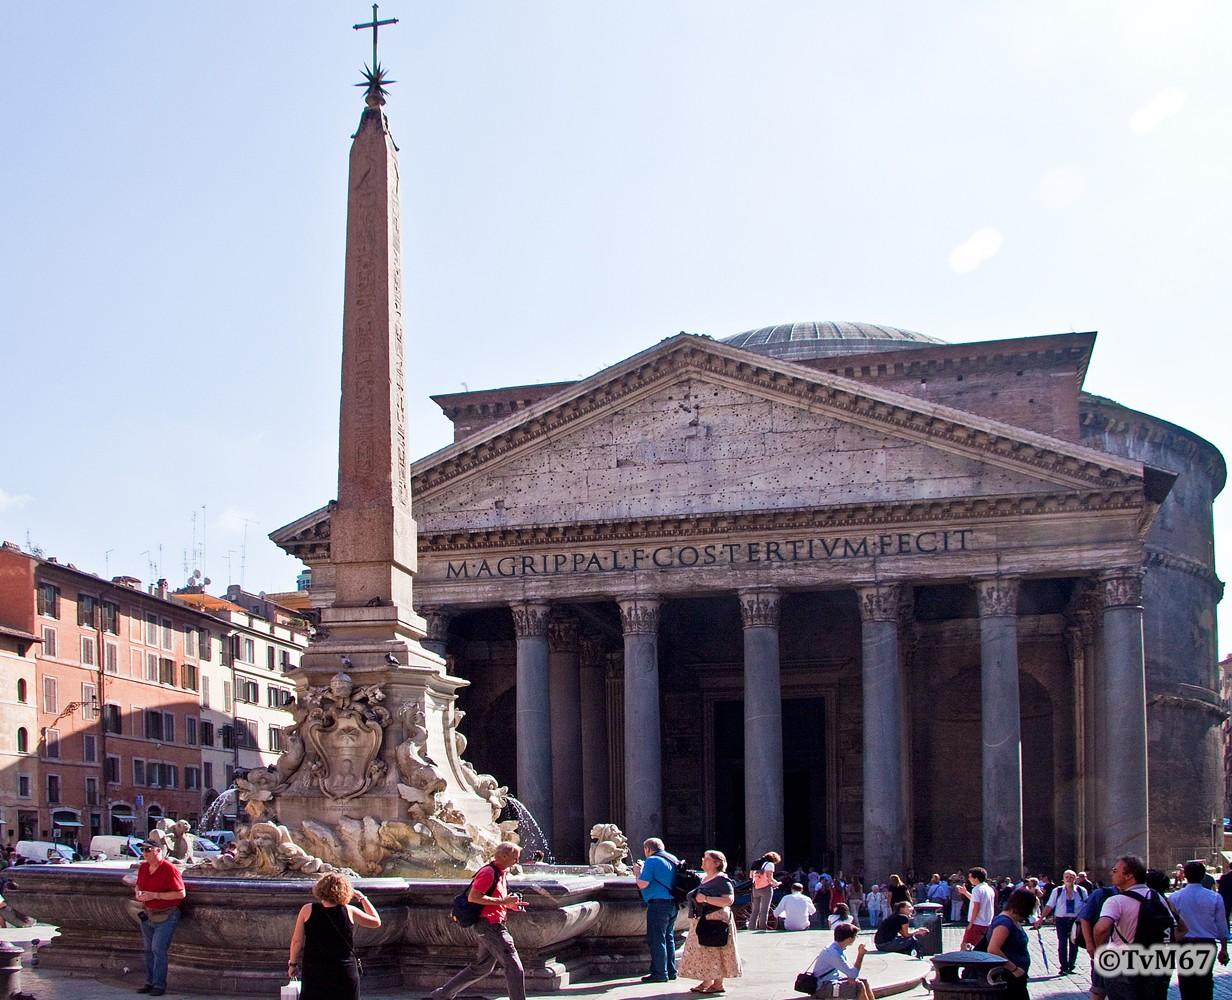 Roma, Piazza della Rotonda, Pantheon, Fontein en obelisk, 2009